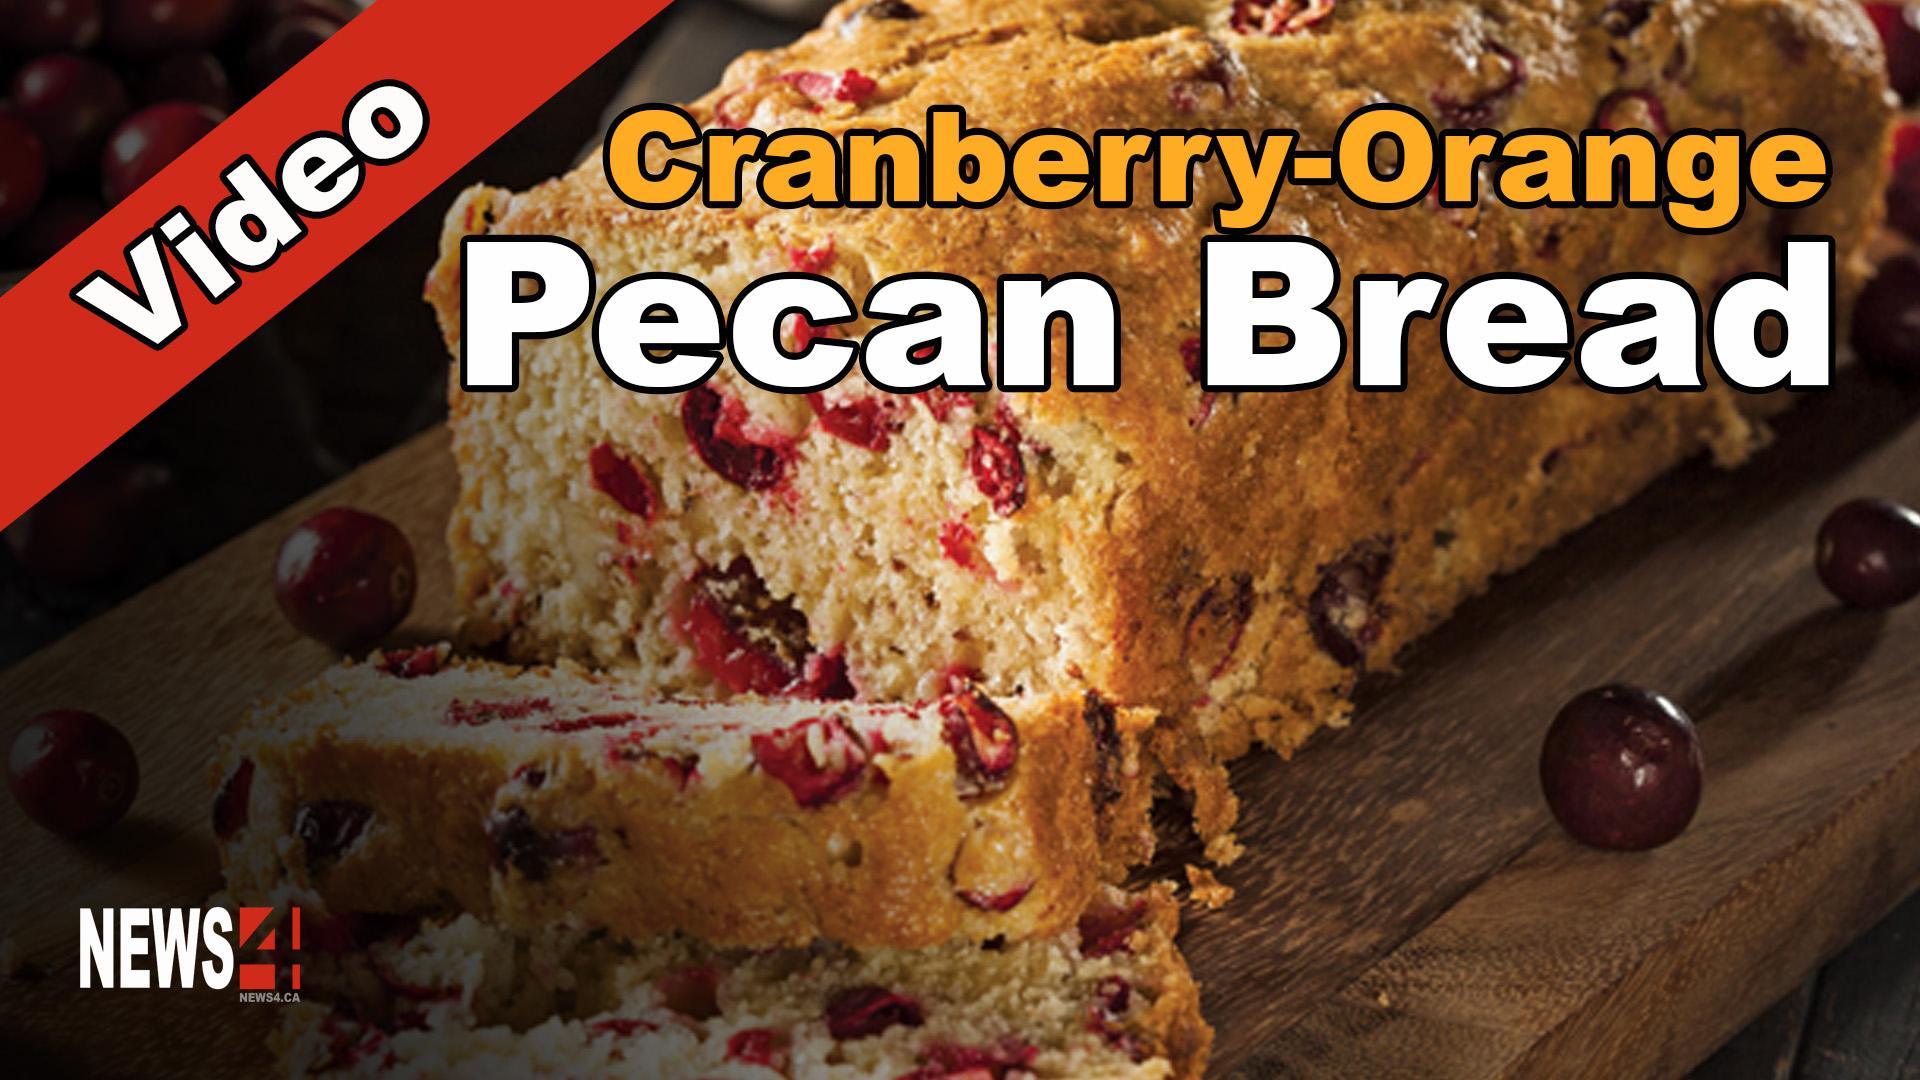 Cranberry-Orange Pecan Bread - News4WInnipeg